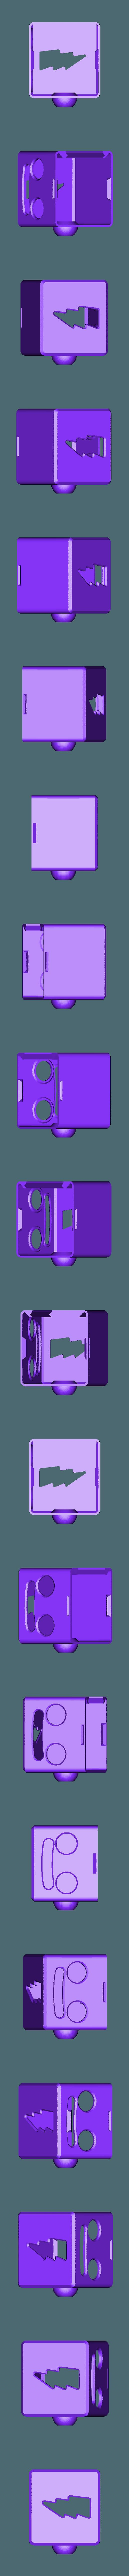 CSS-box-head-a.stl Download free STL file Hand Crank Solder Dispenser • 3D printable design, Adafruit